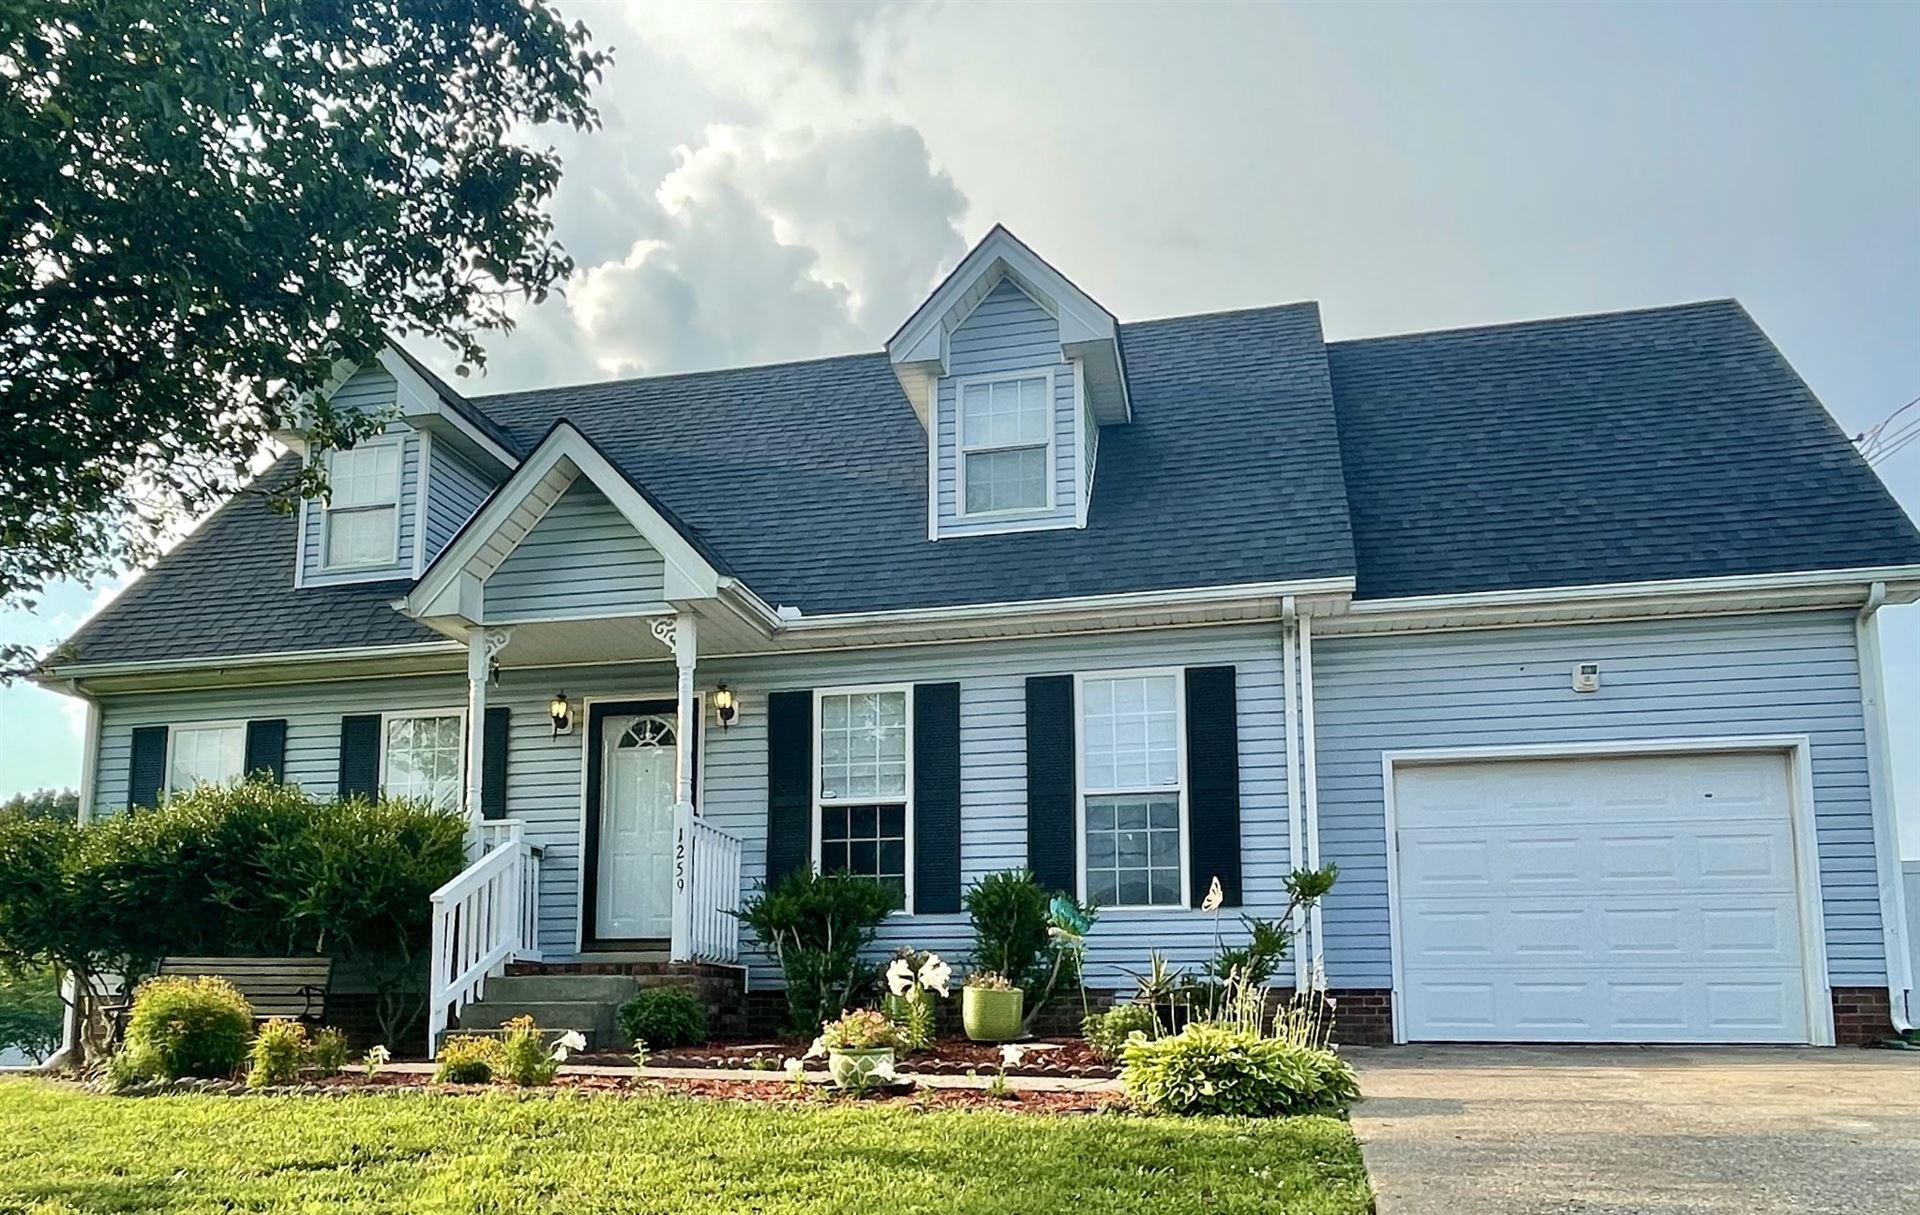 1259 Barbee Ln, Clarksville, TN 37042 - MLS#: 2262289